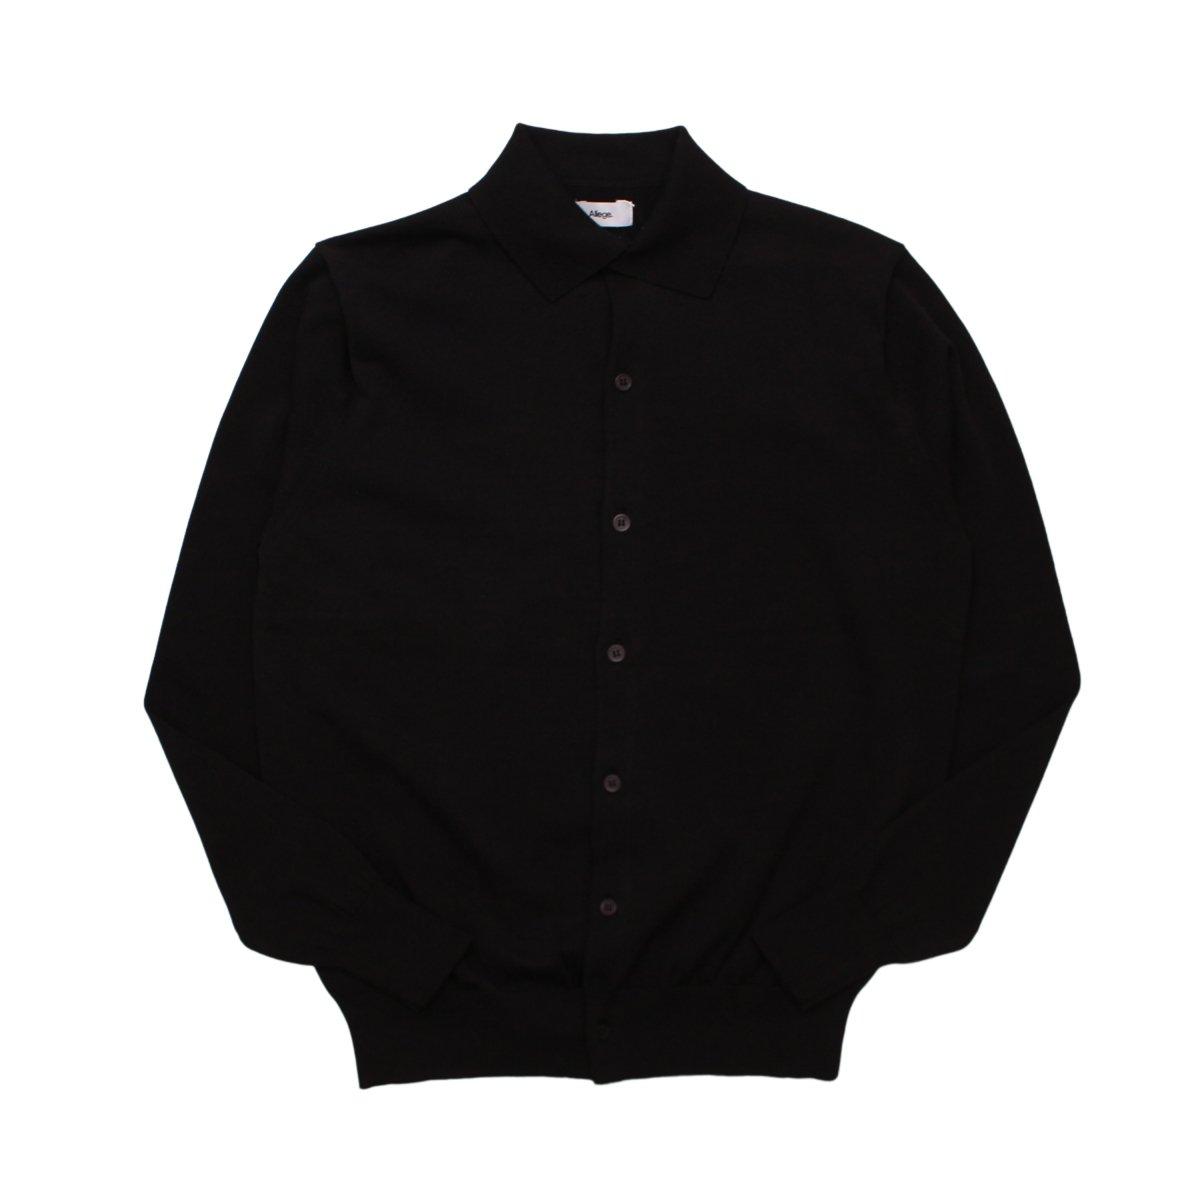 Standard Twist Yarn Cardigan 【BLACK】